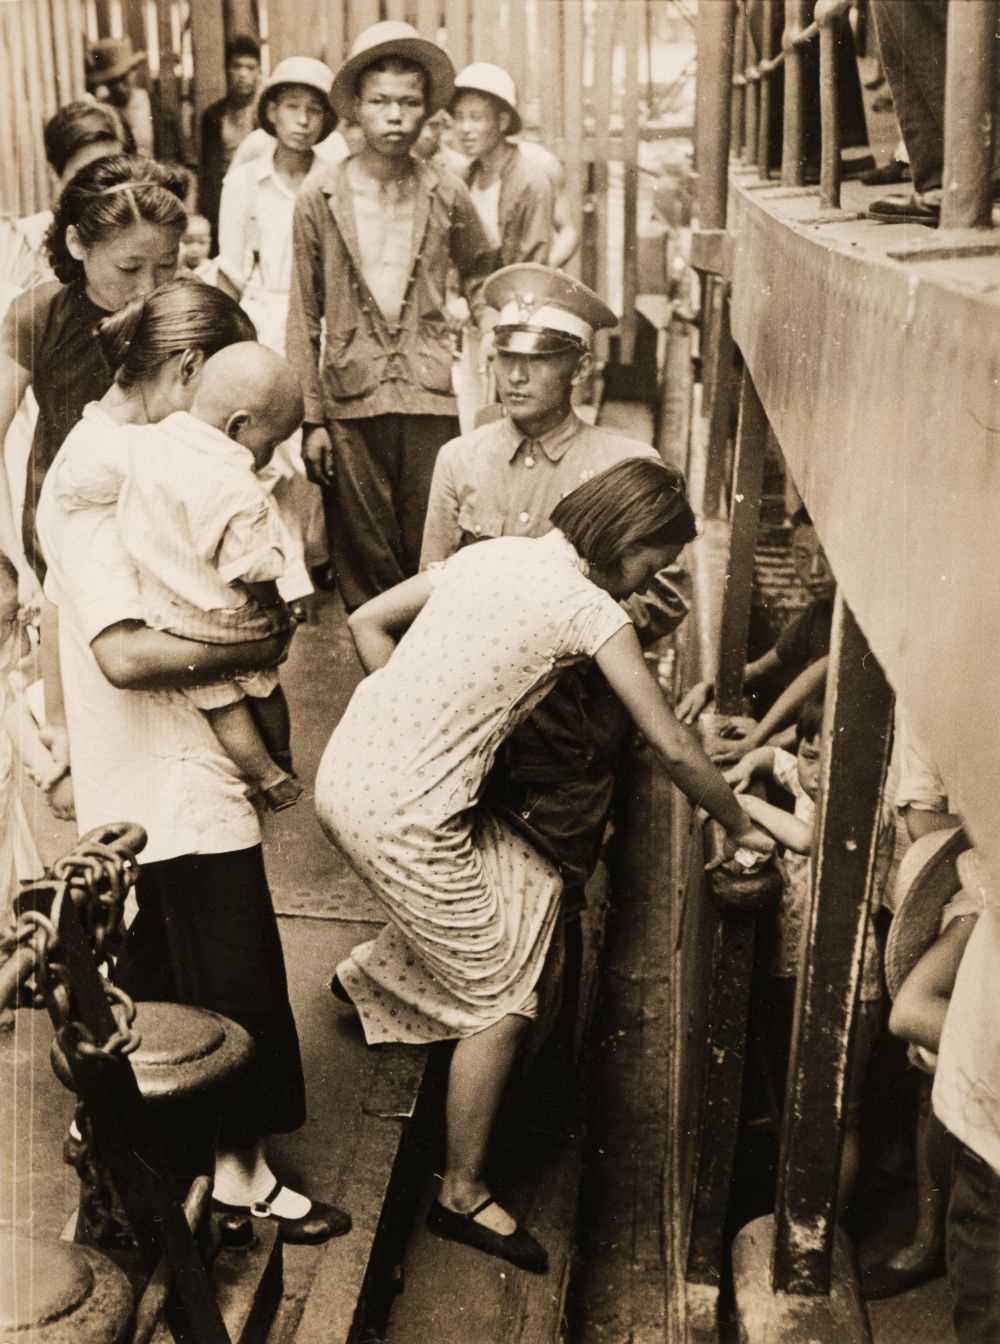 Lot 14 - Capa (Robert, 1913-1954). Hankow's War Orphans are Evacuated, 1938